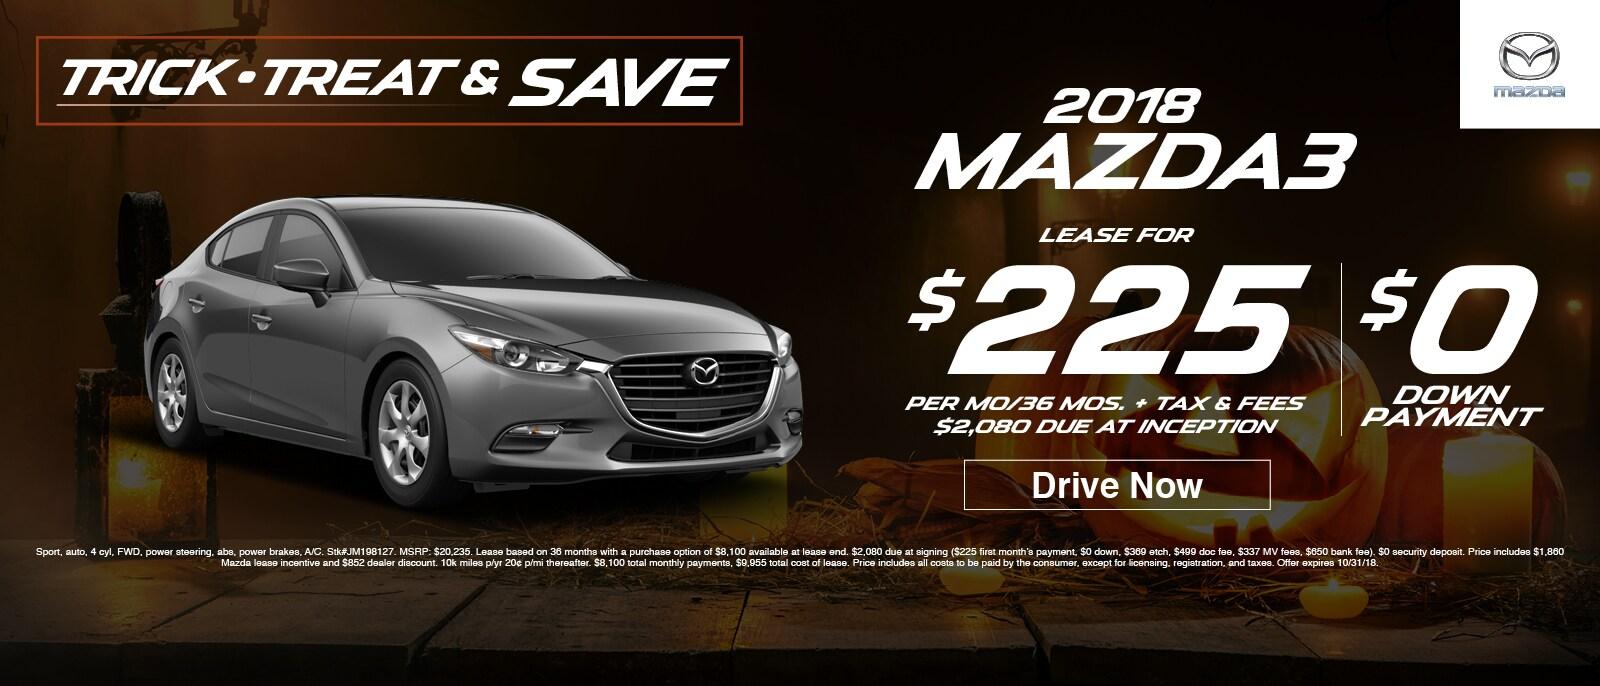 New Mazda And Used Car Dealer Serving Union | Maxon Mazda